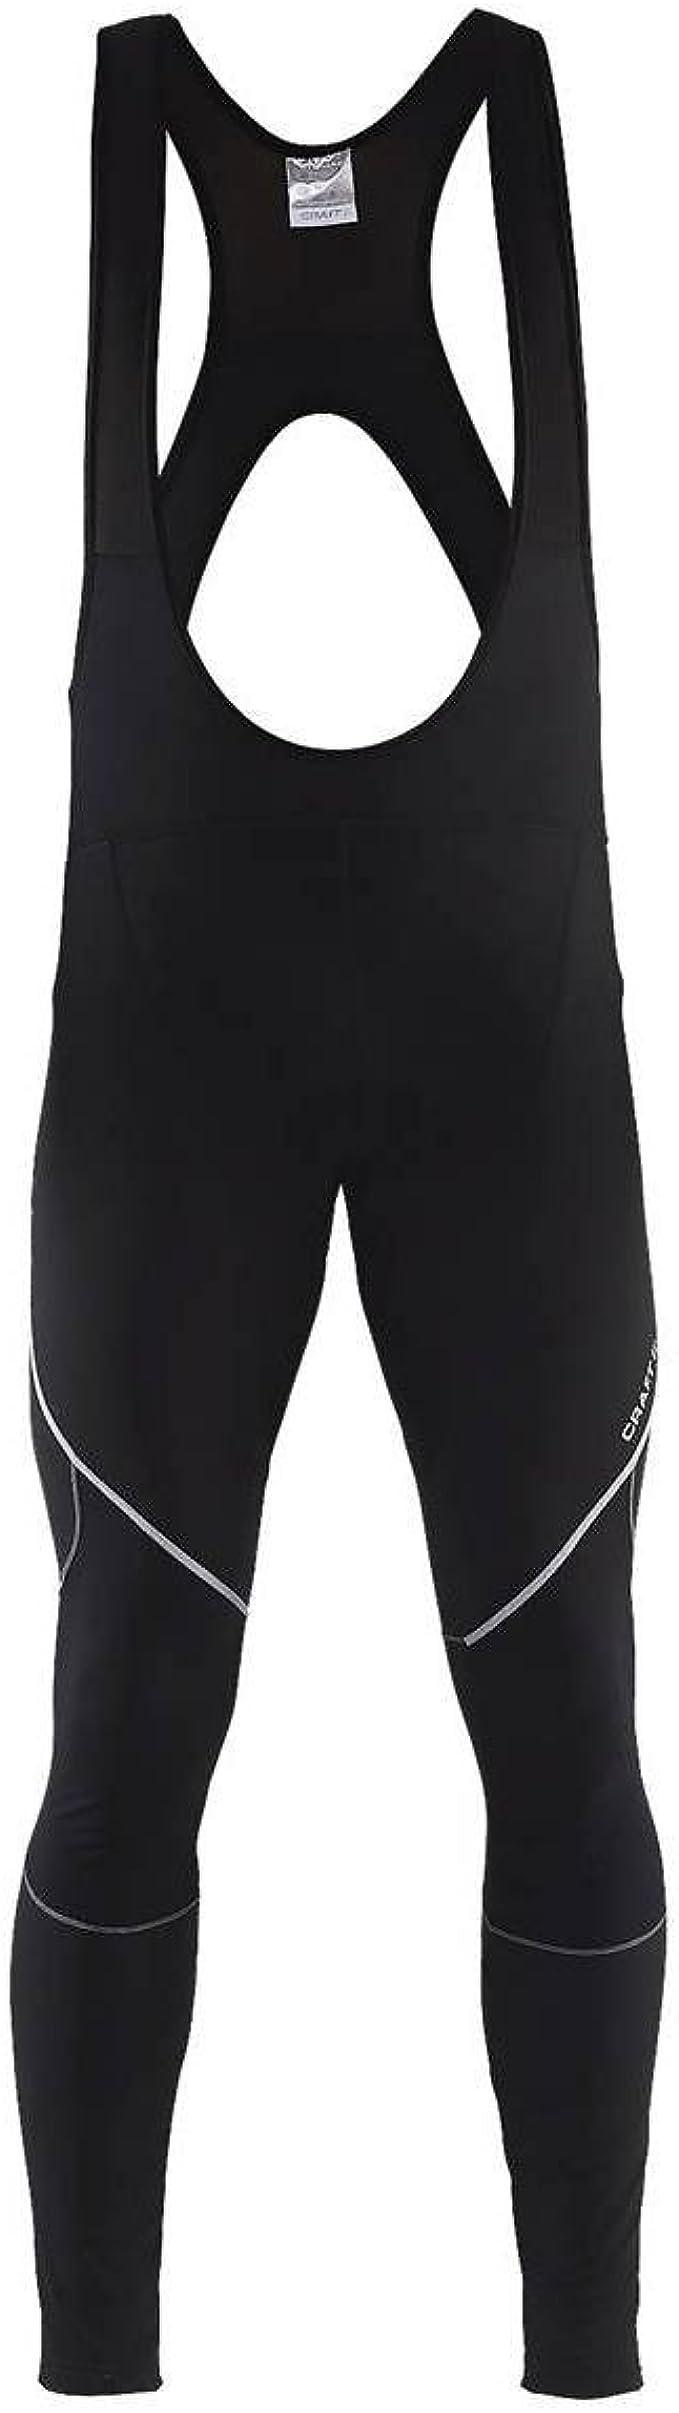 Craft Uomo Verve Calzamaglia M Pantaloncini da Ciclista